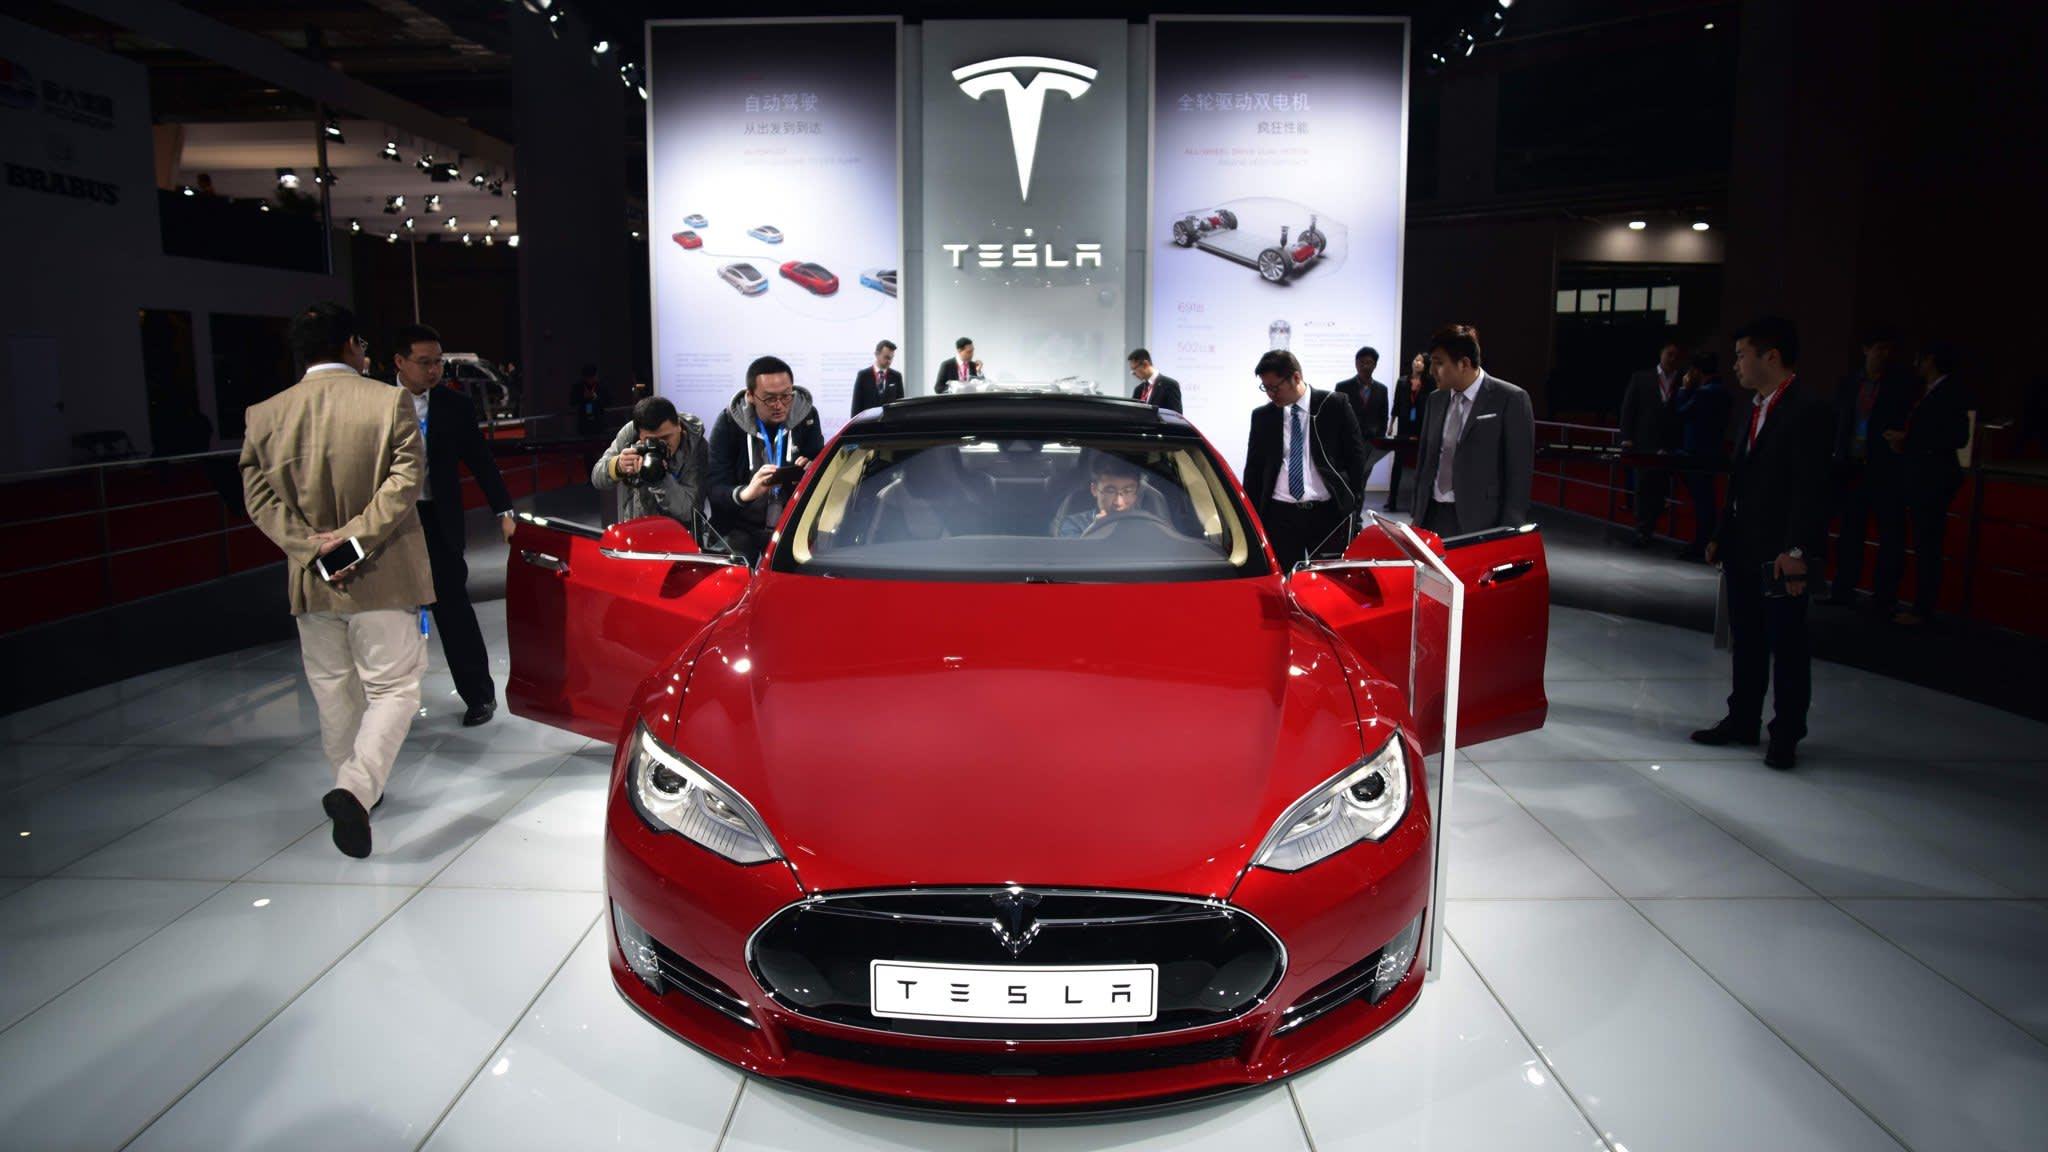 Tesla recalls 123,000 Model S sedans